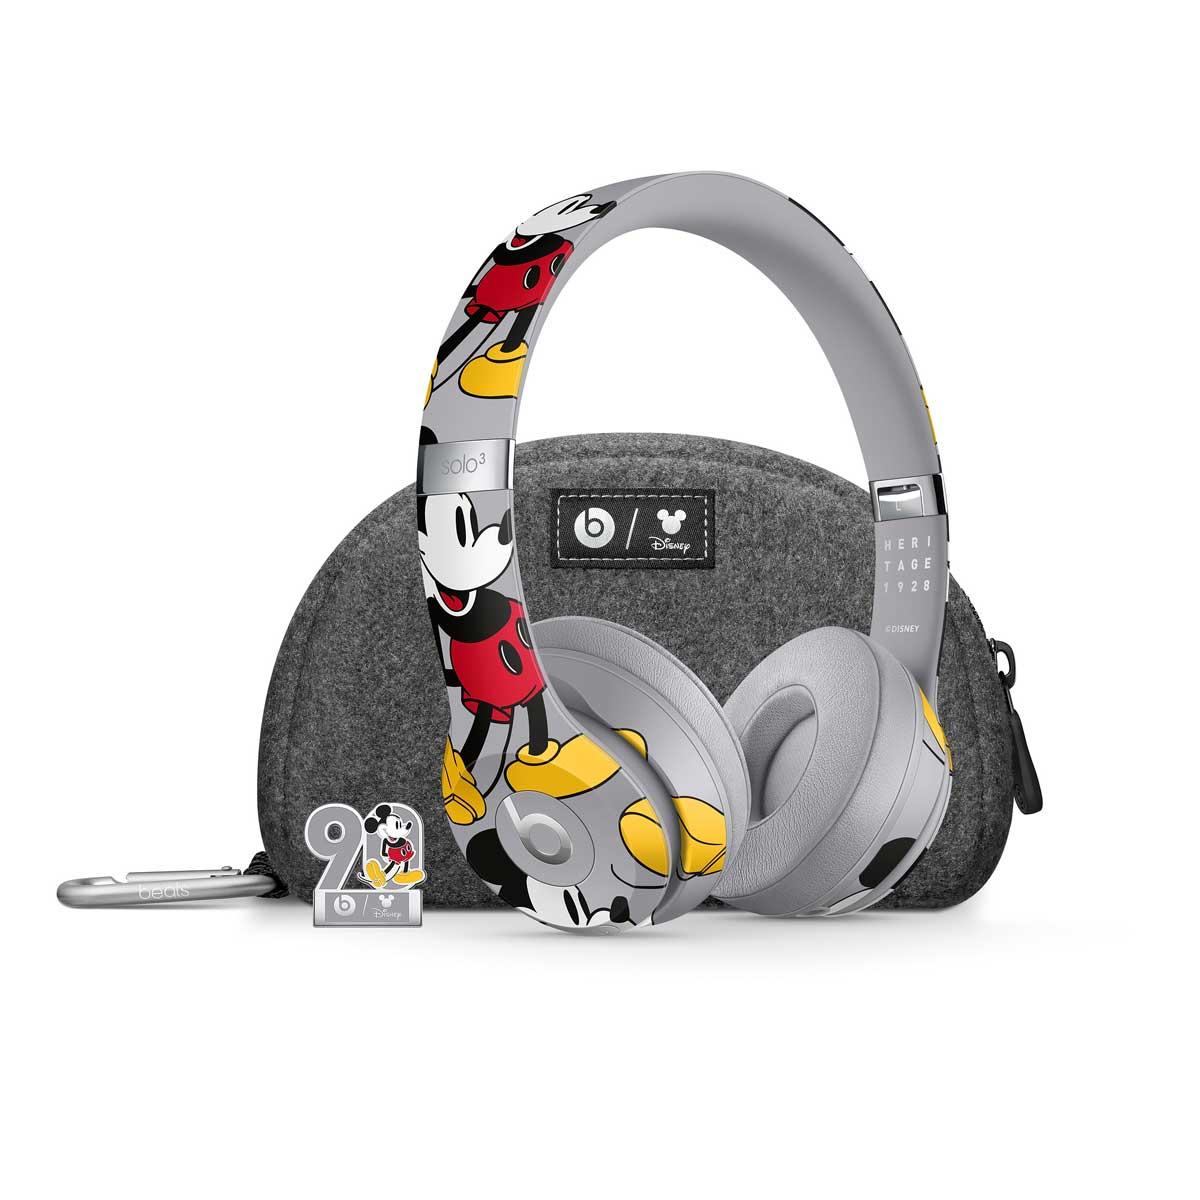 Disney Mikey Mouse 90th Edition Beats Headphones Australia